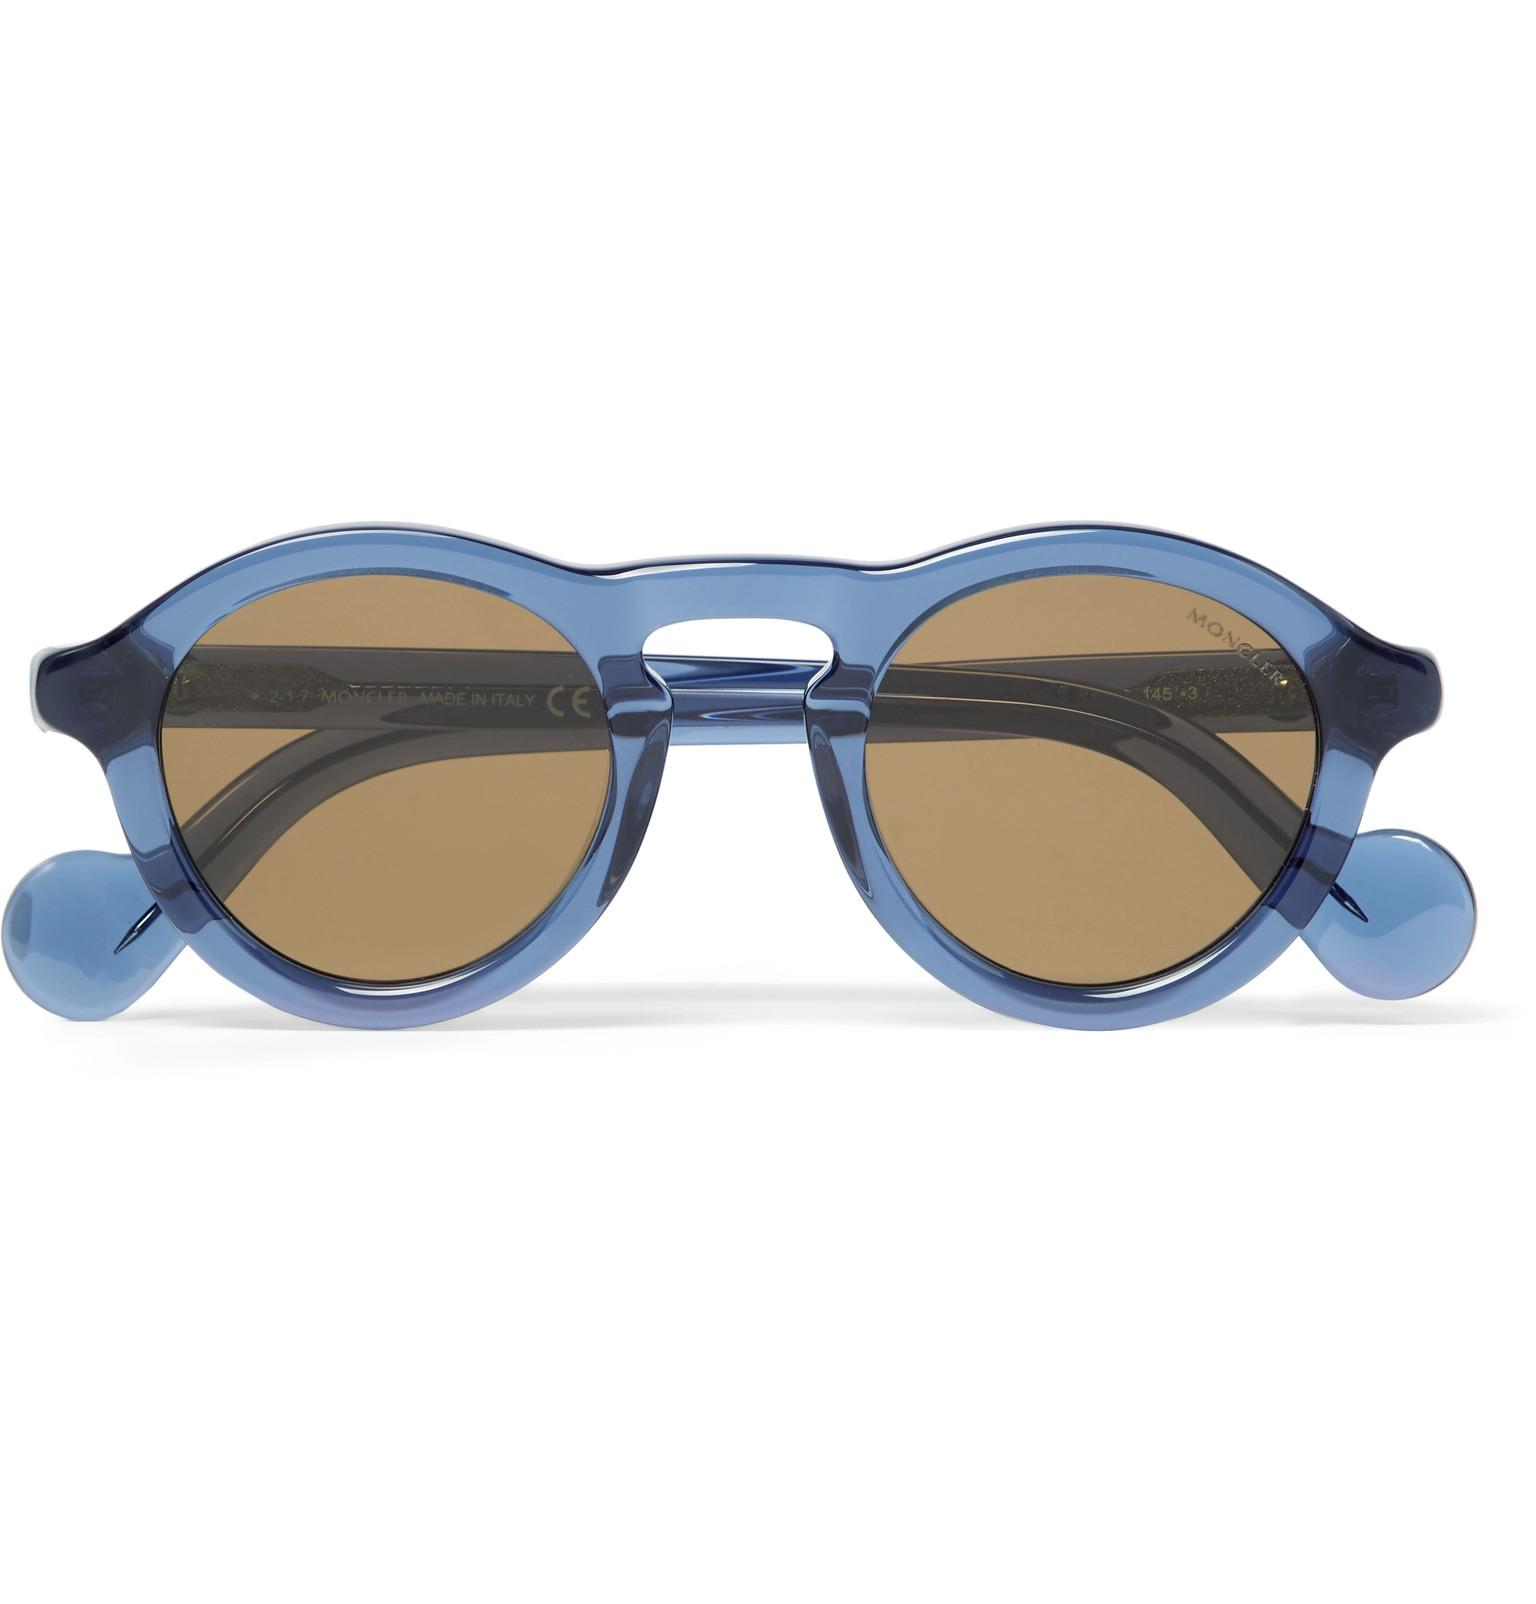 Moncler Round-frame Acatete Polarised Sunglasses - Black CPRJb